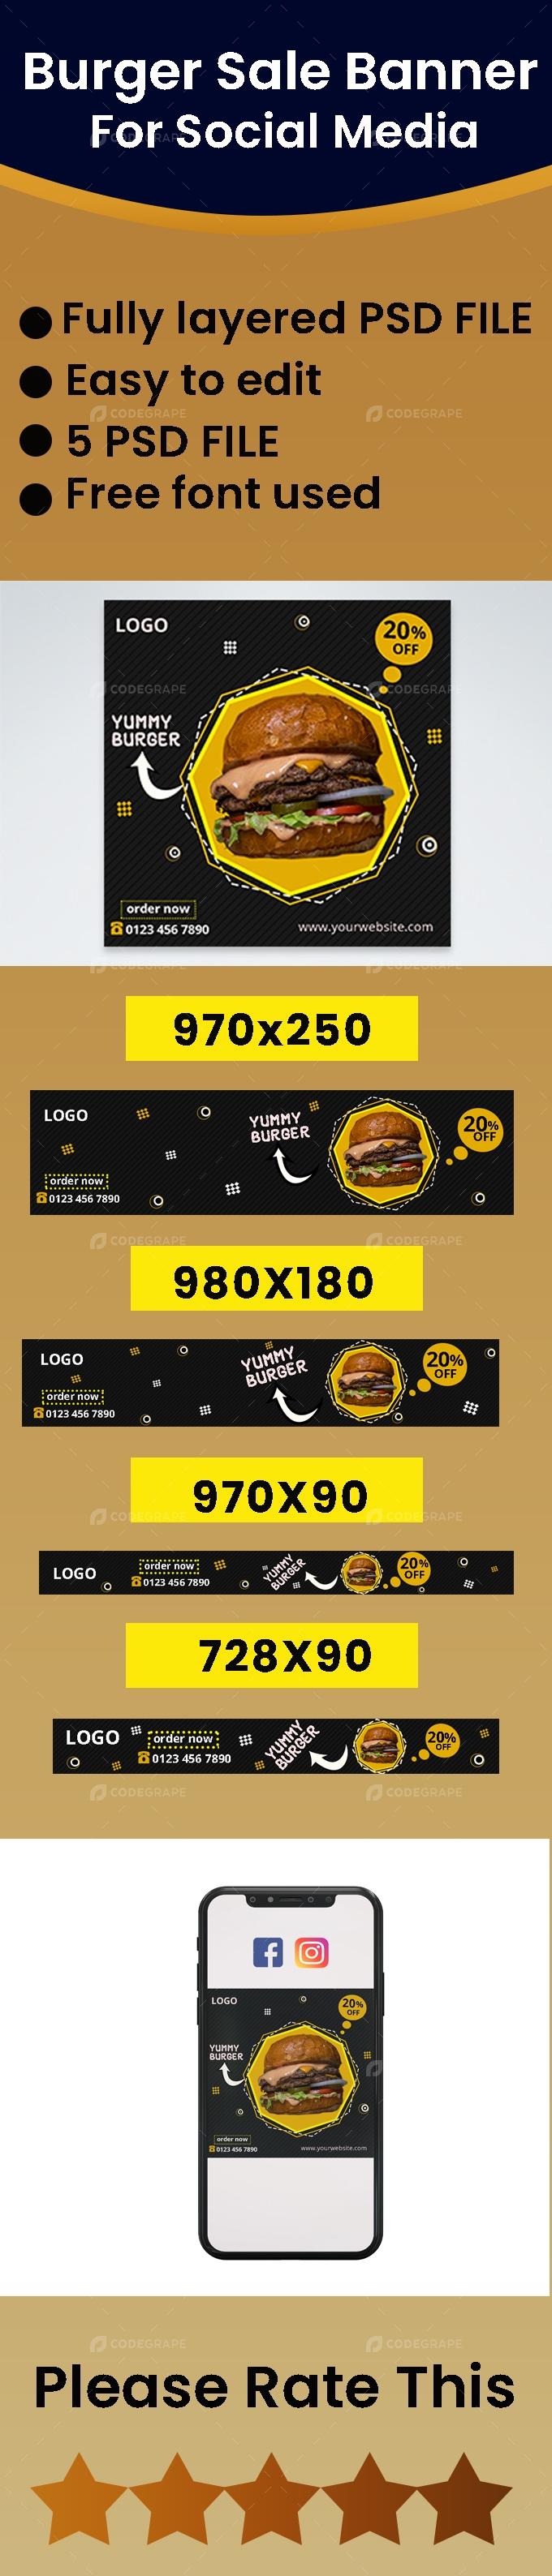 Burger Sale Banner For Social Media